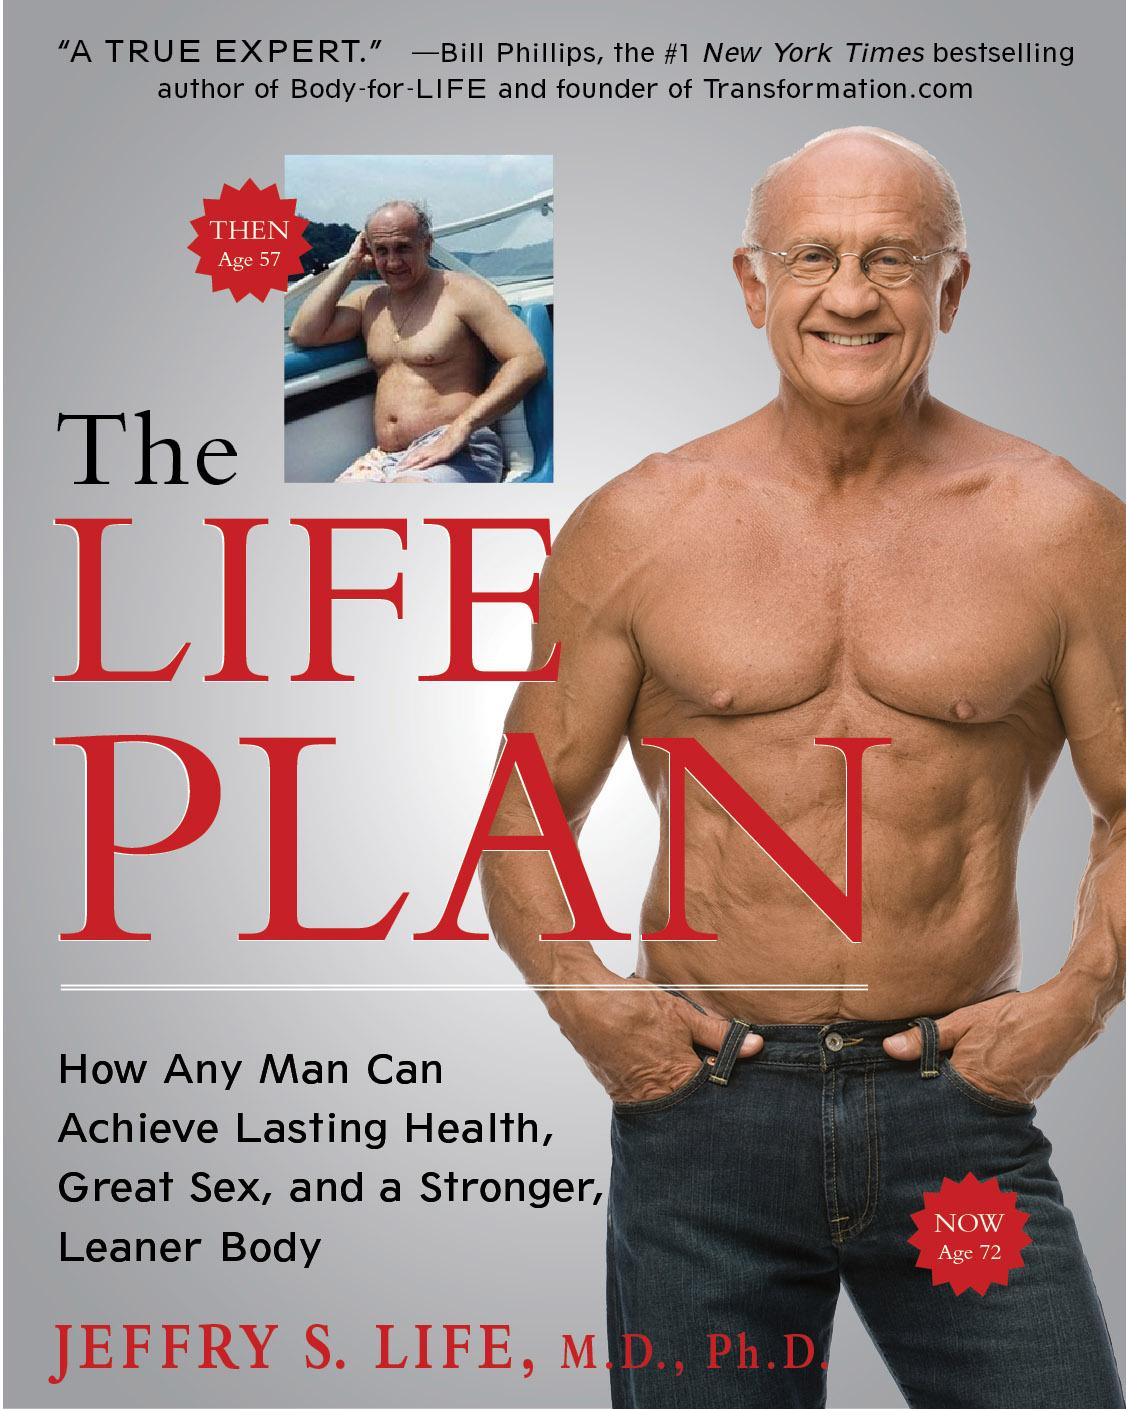 anti steroid ads